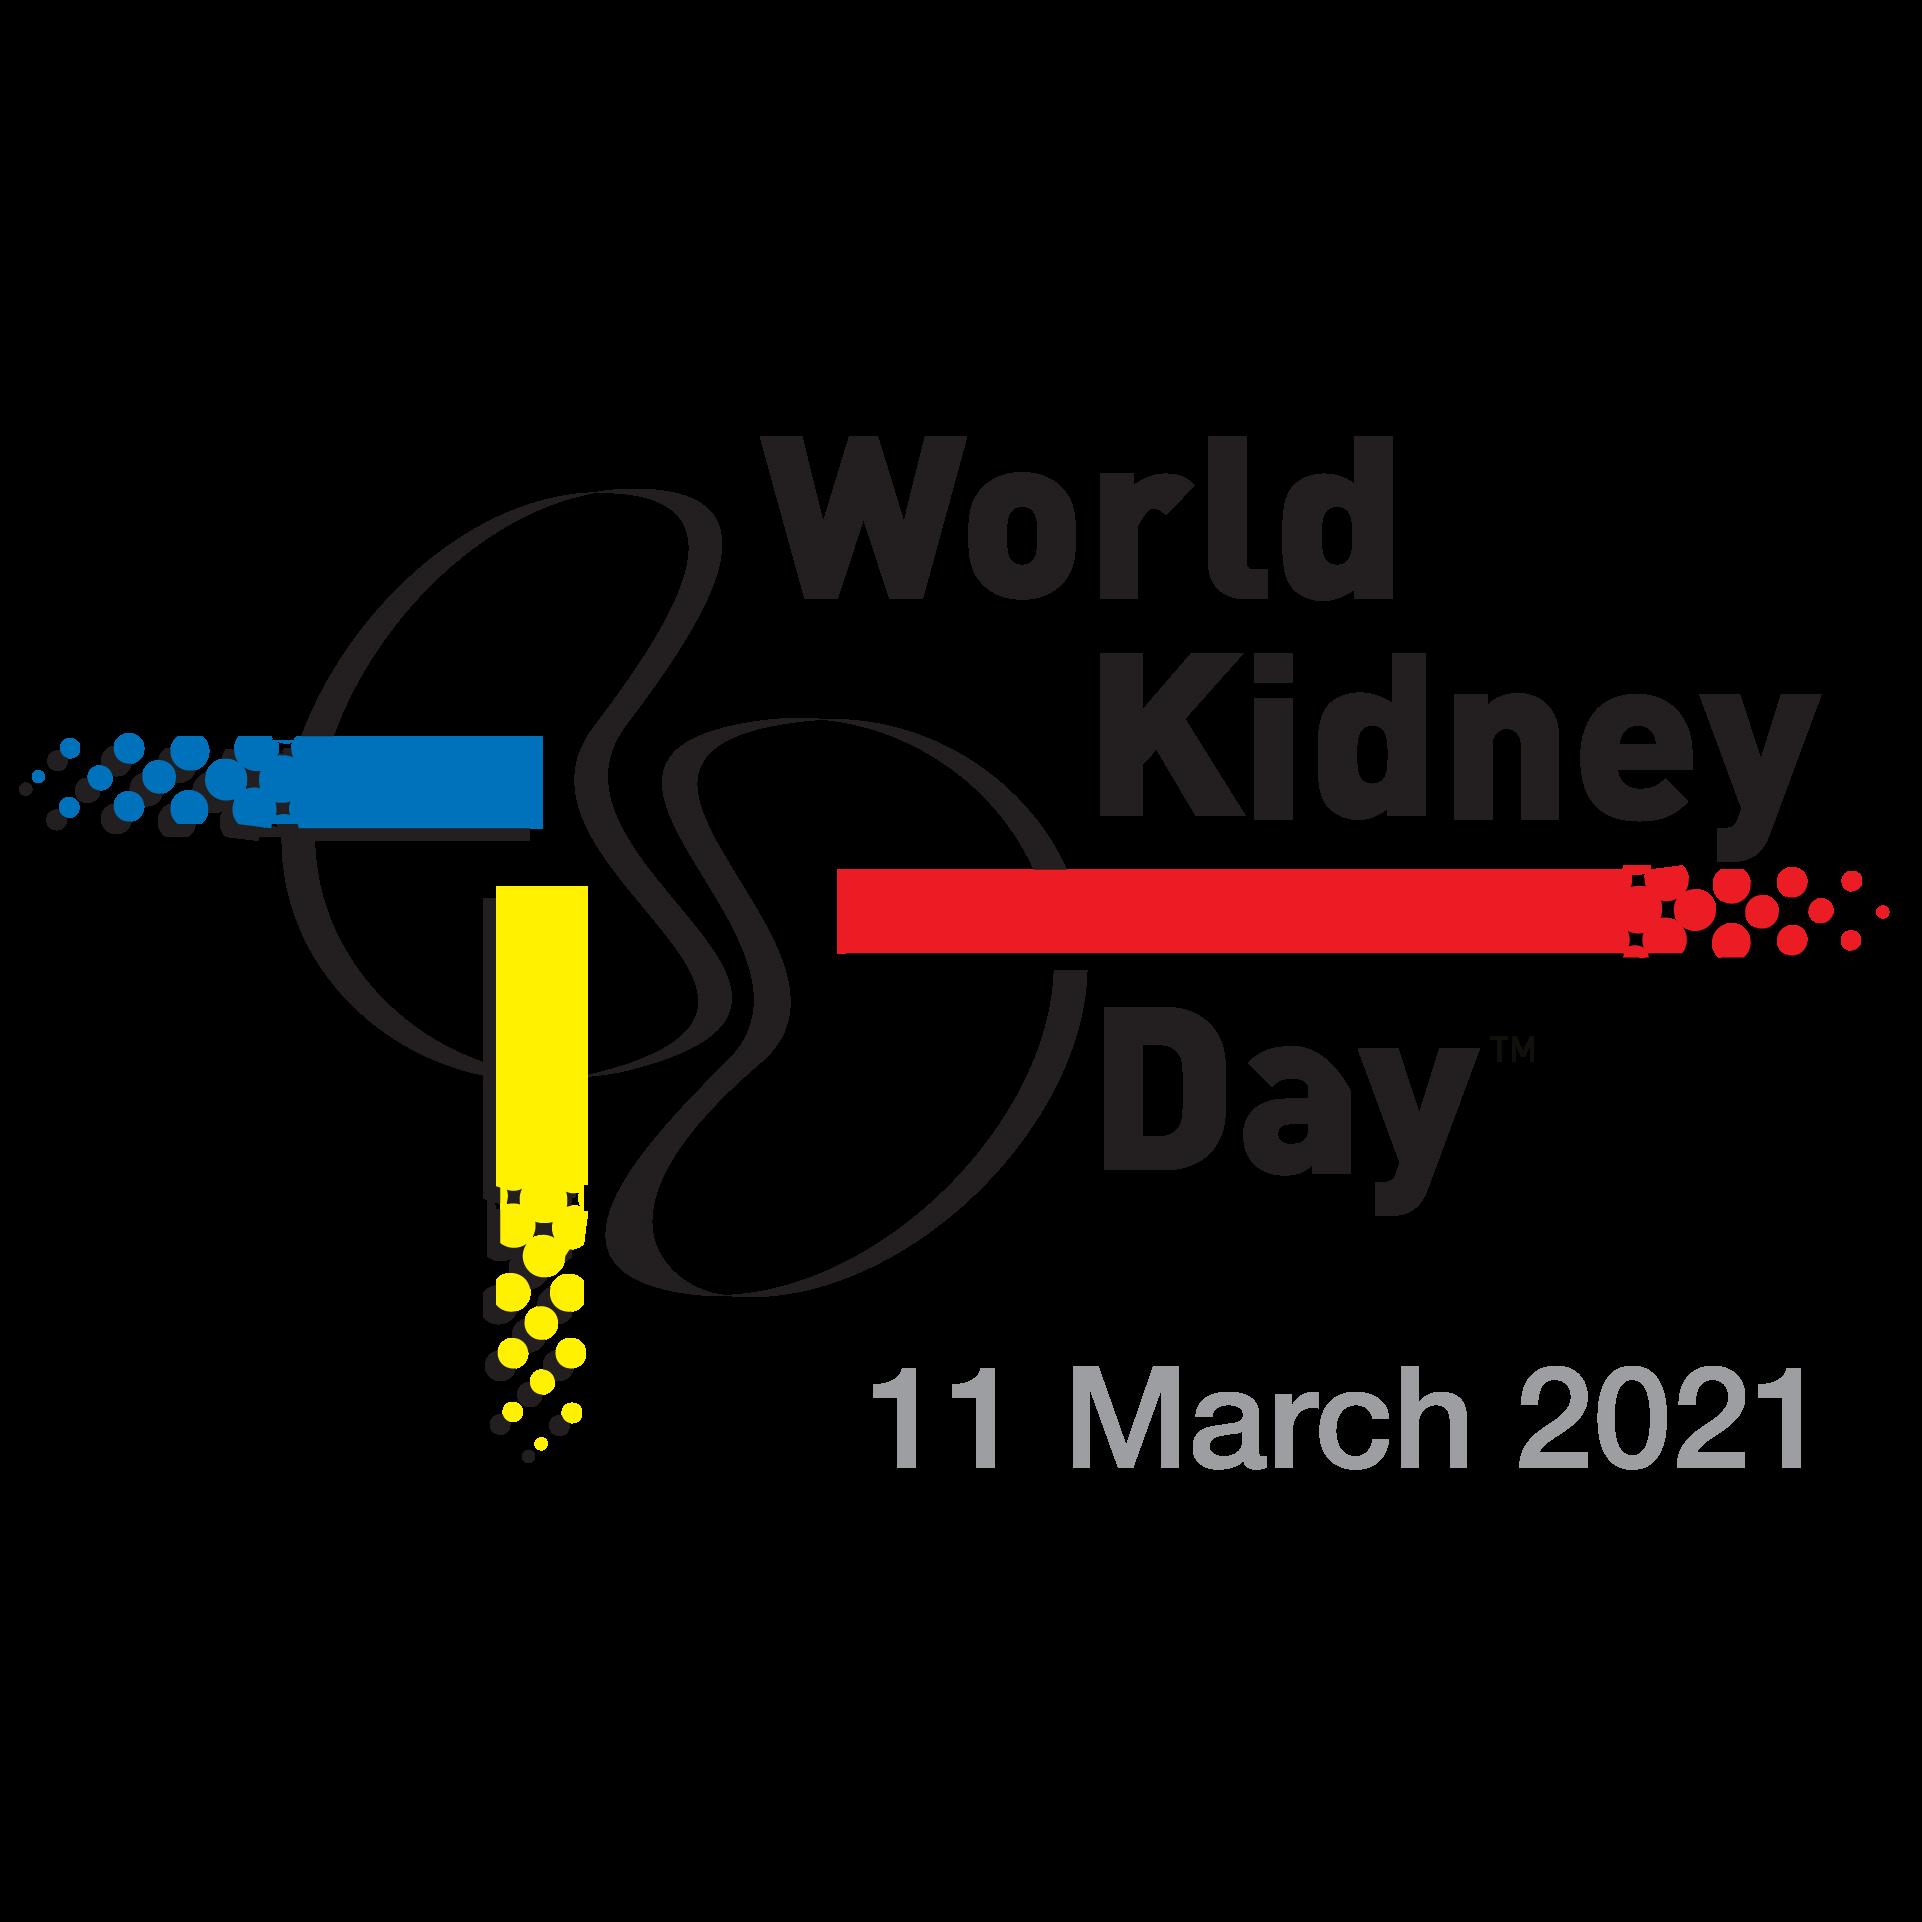 WKD 2021 Logo (with date) - World Kidney Day